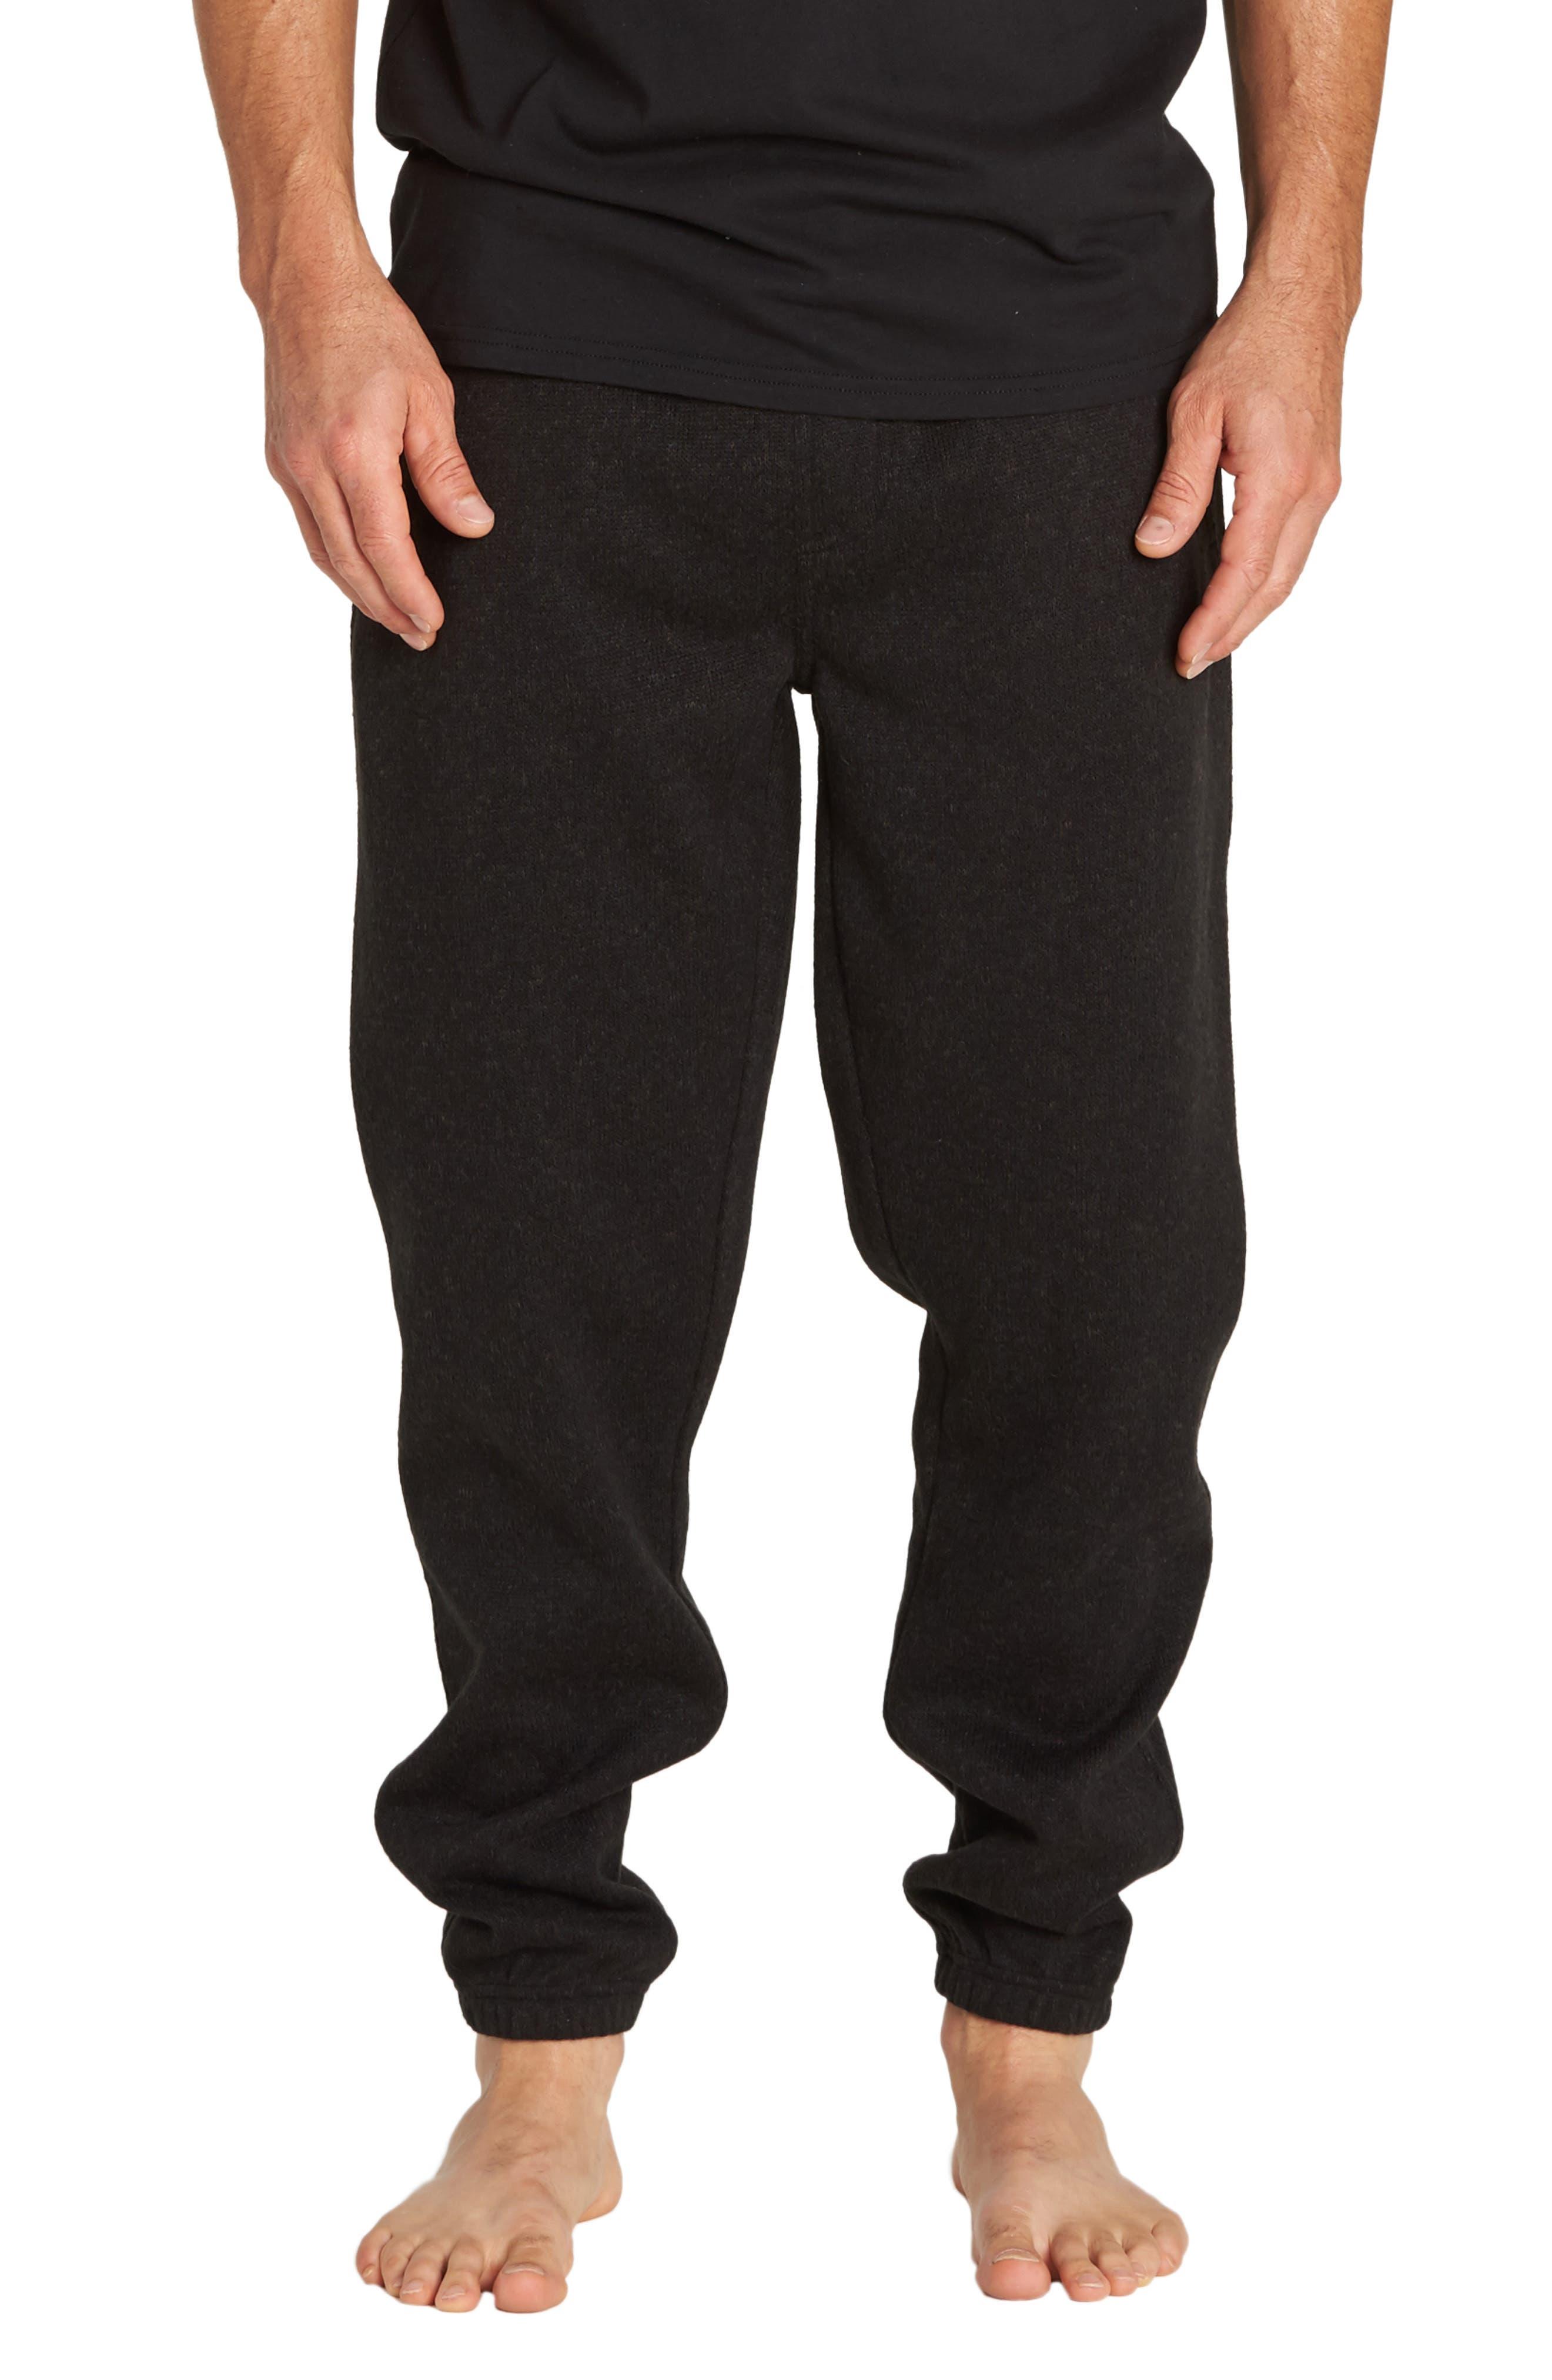 Boundary Sweatpants,                             Main thumbnail 1, color,                             BLACK HEATHER